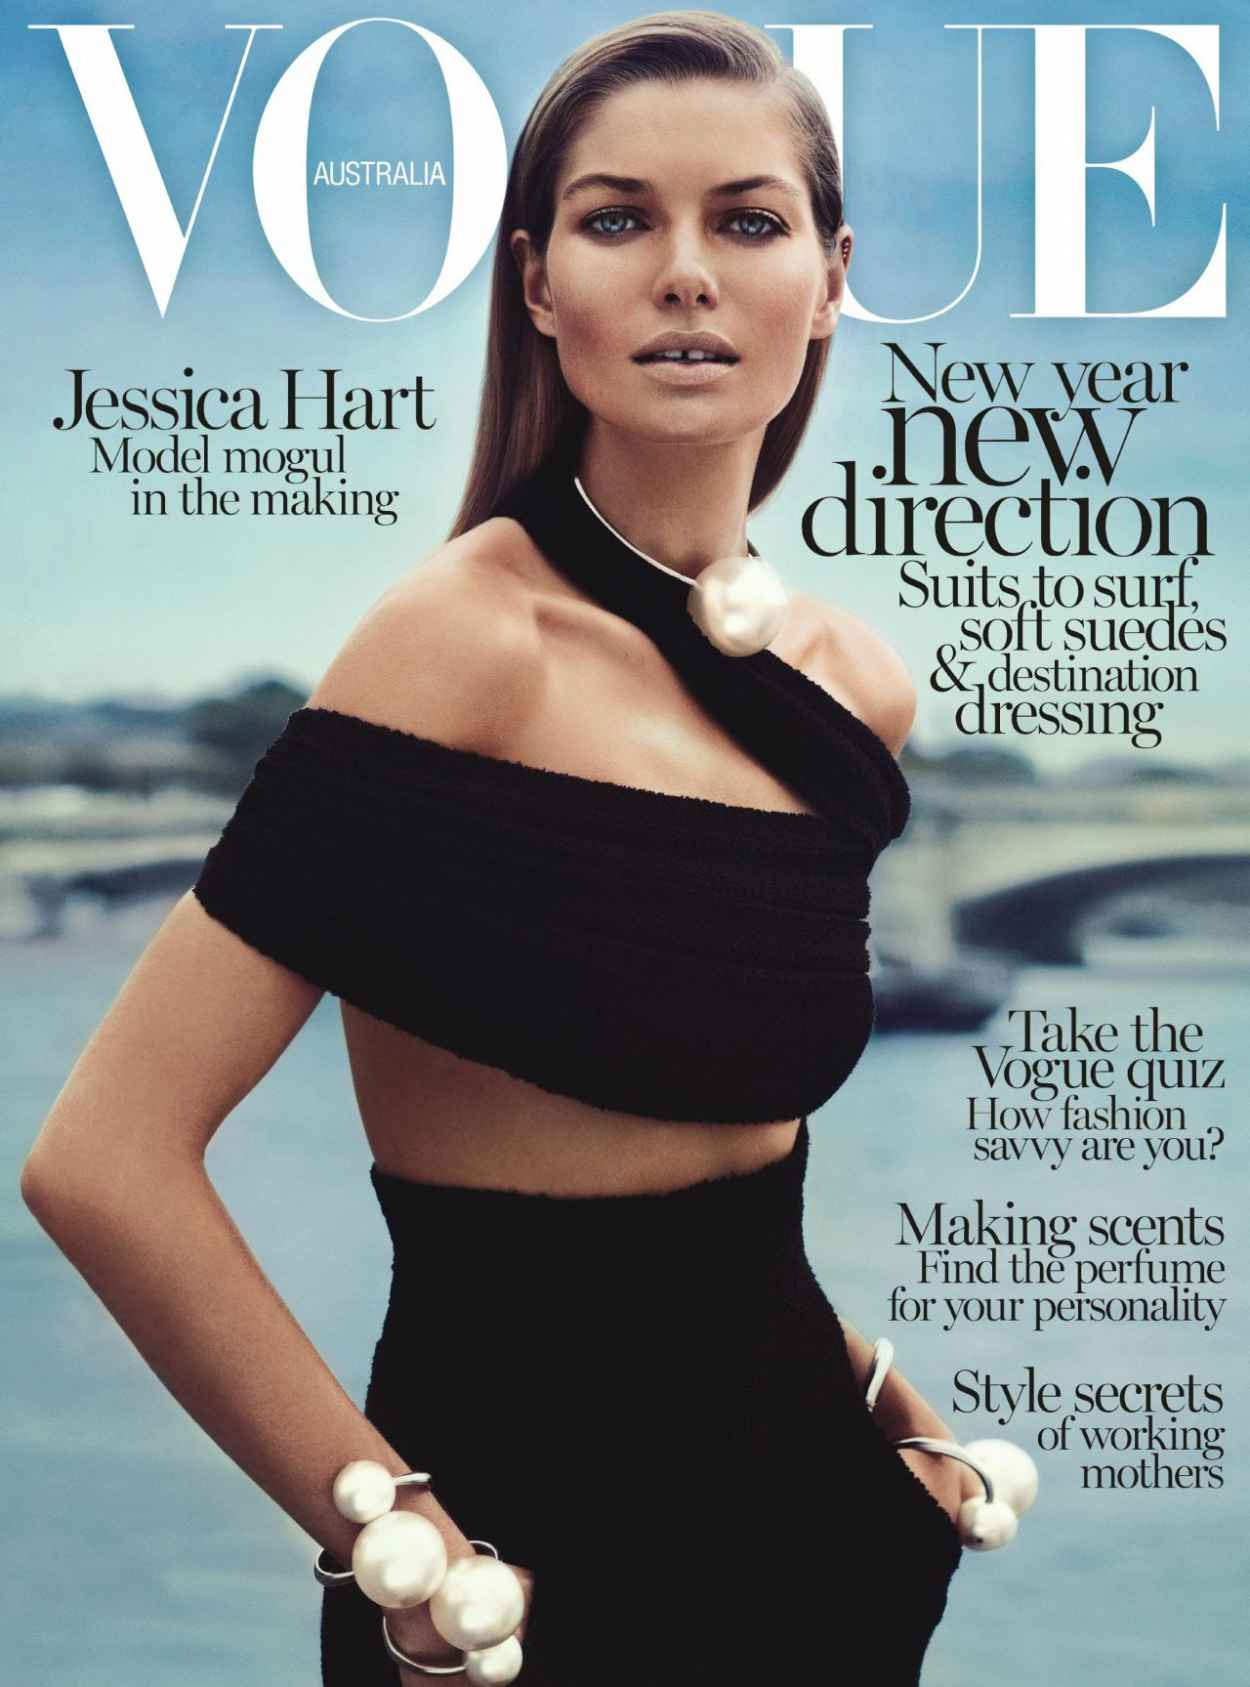 Jessica Hart - VOGUE Magazine (Australia) - January 2015 Issue-1